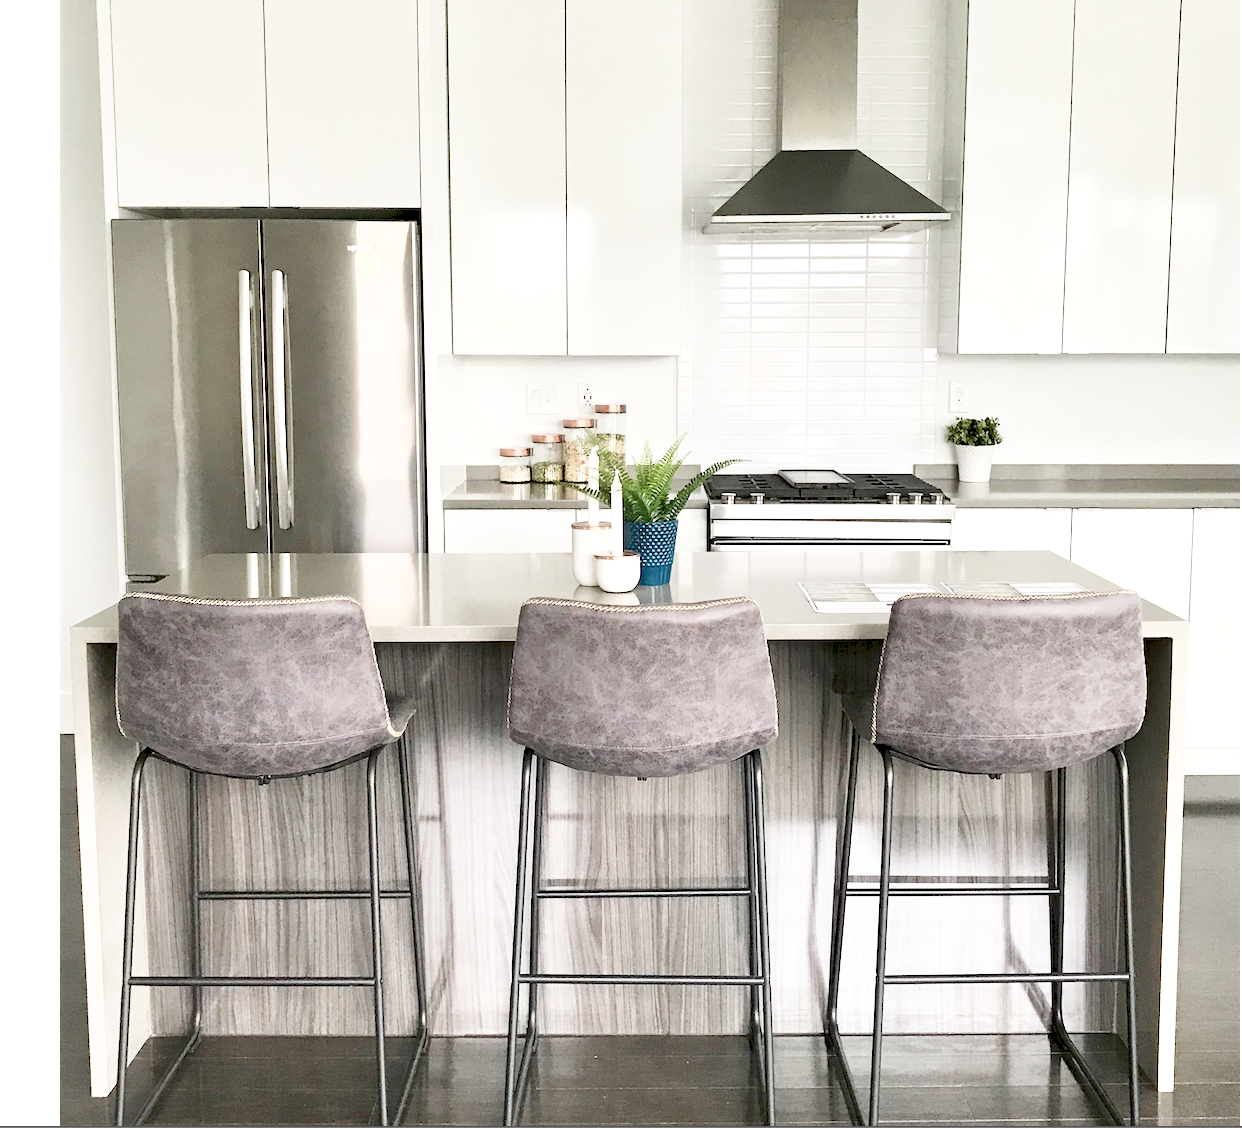 Modern kitchen design with barstools interior by natasha nicolaou natnico designs also rh pinterest